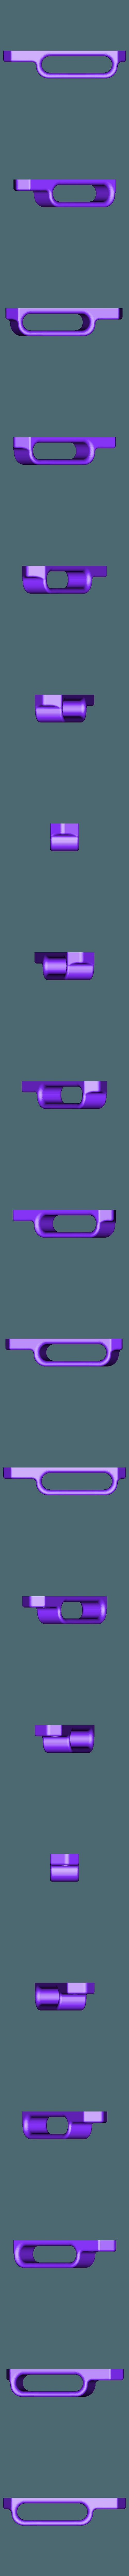 door_handle_RH_V2.0.stl Download free STL file IKEA Lack Door handle and latch mount • 3D printer template, gnattycole